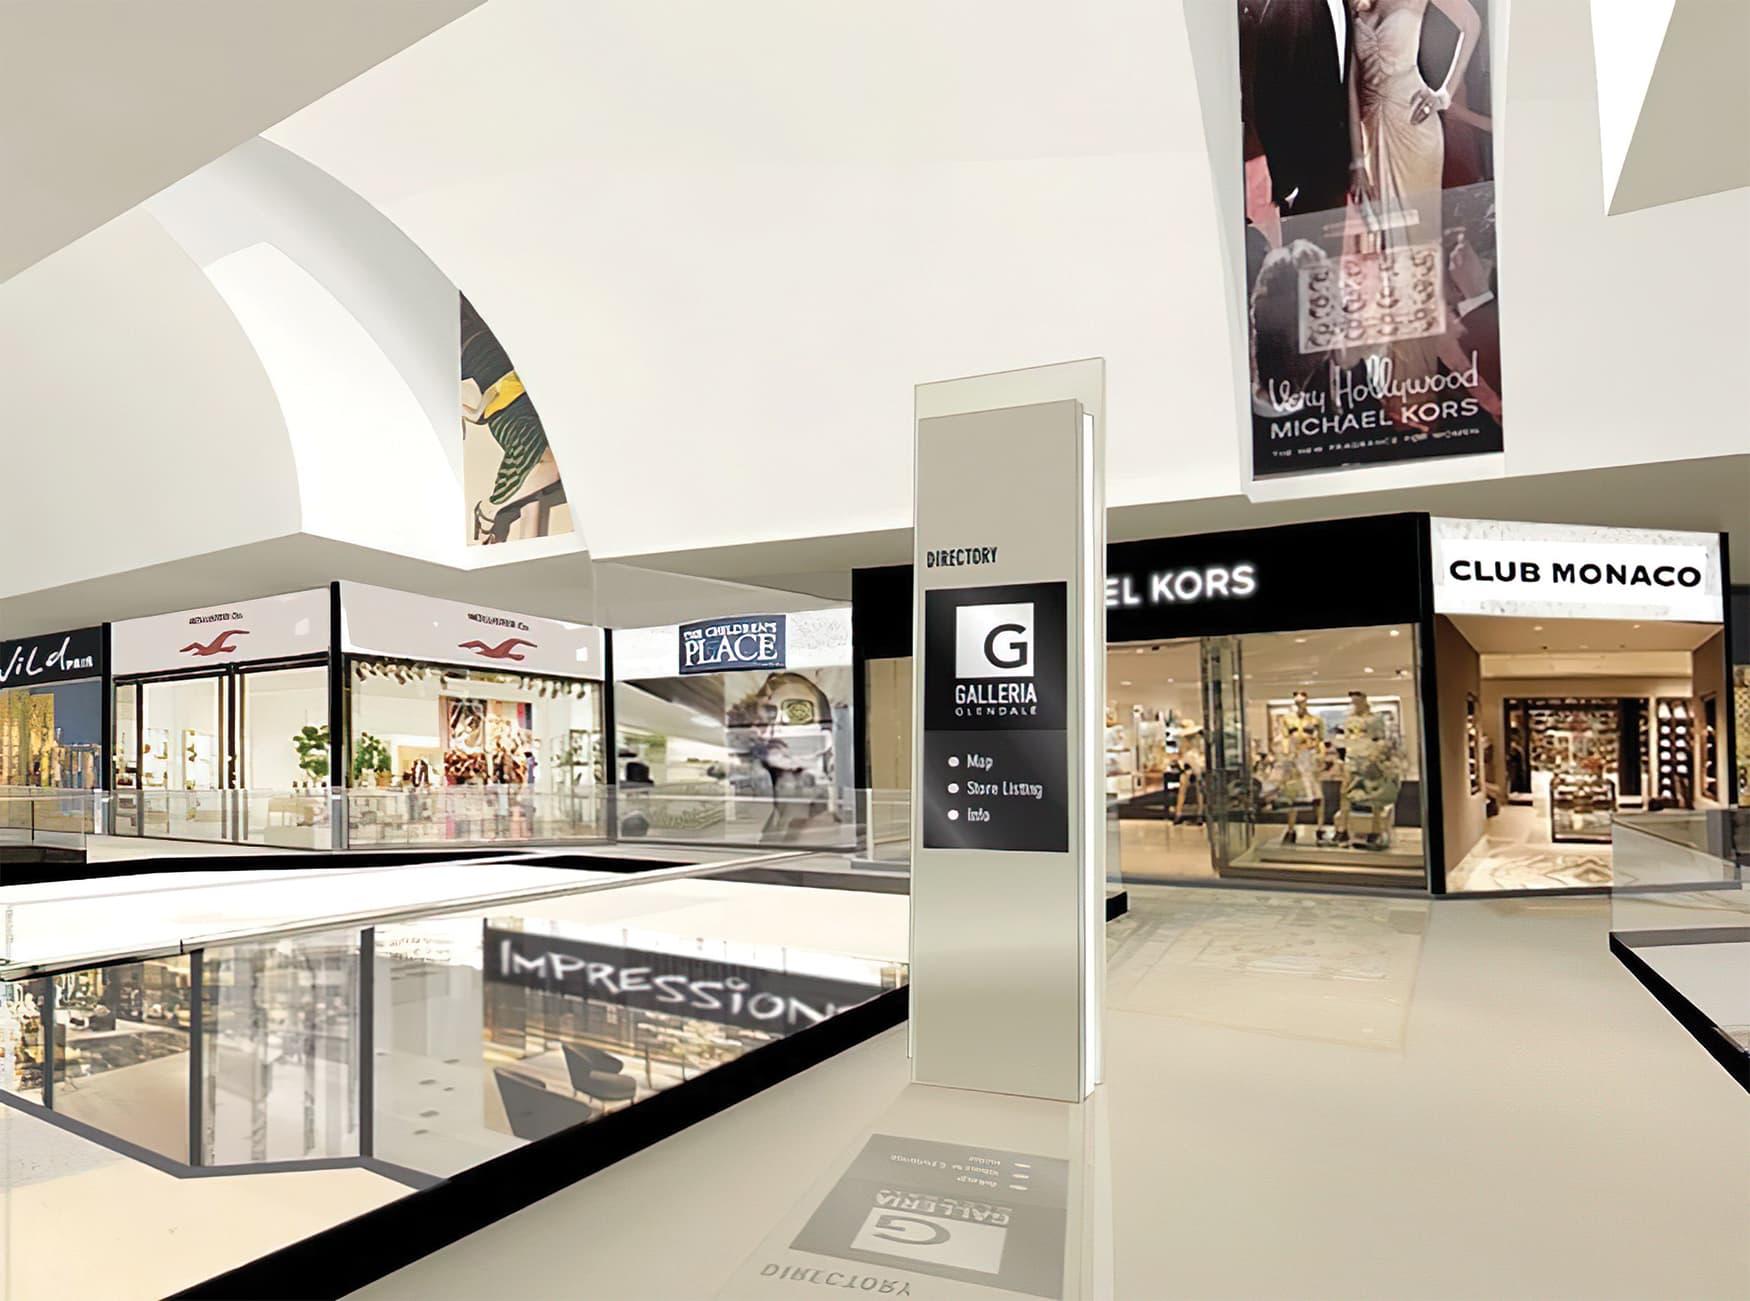 Glendale Galleria. A retail destination in Glendale, California. Project Directory Design.